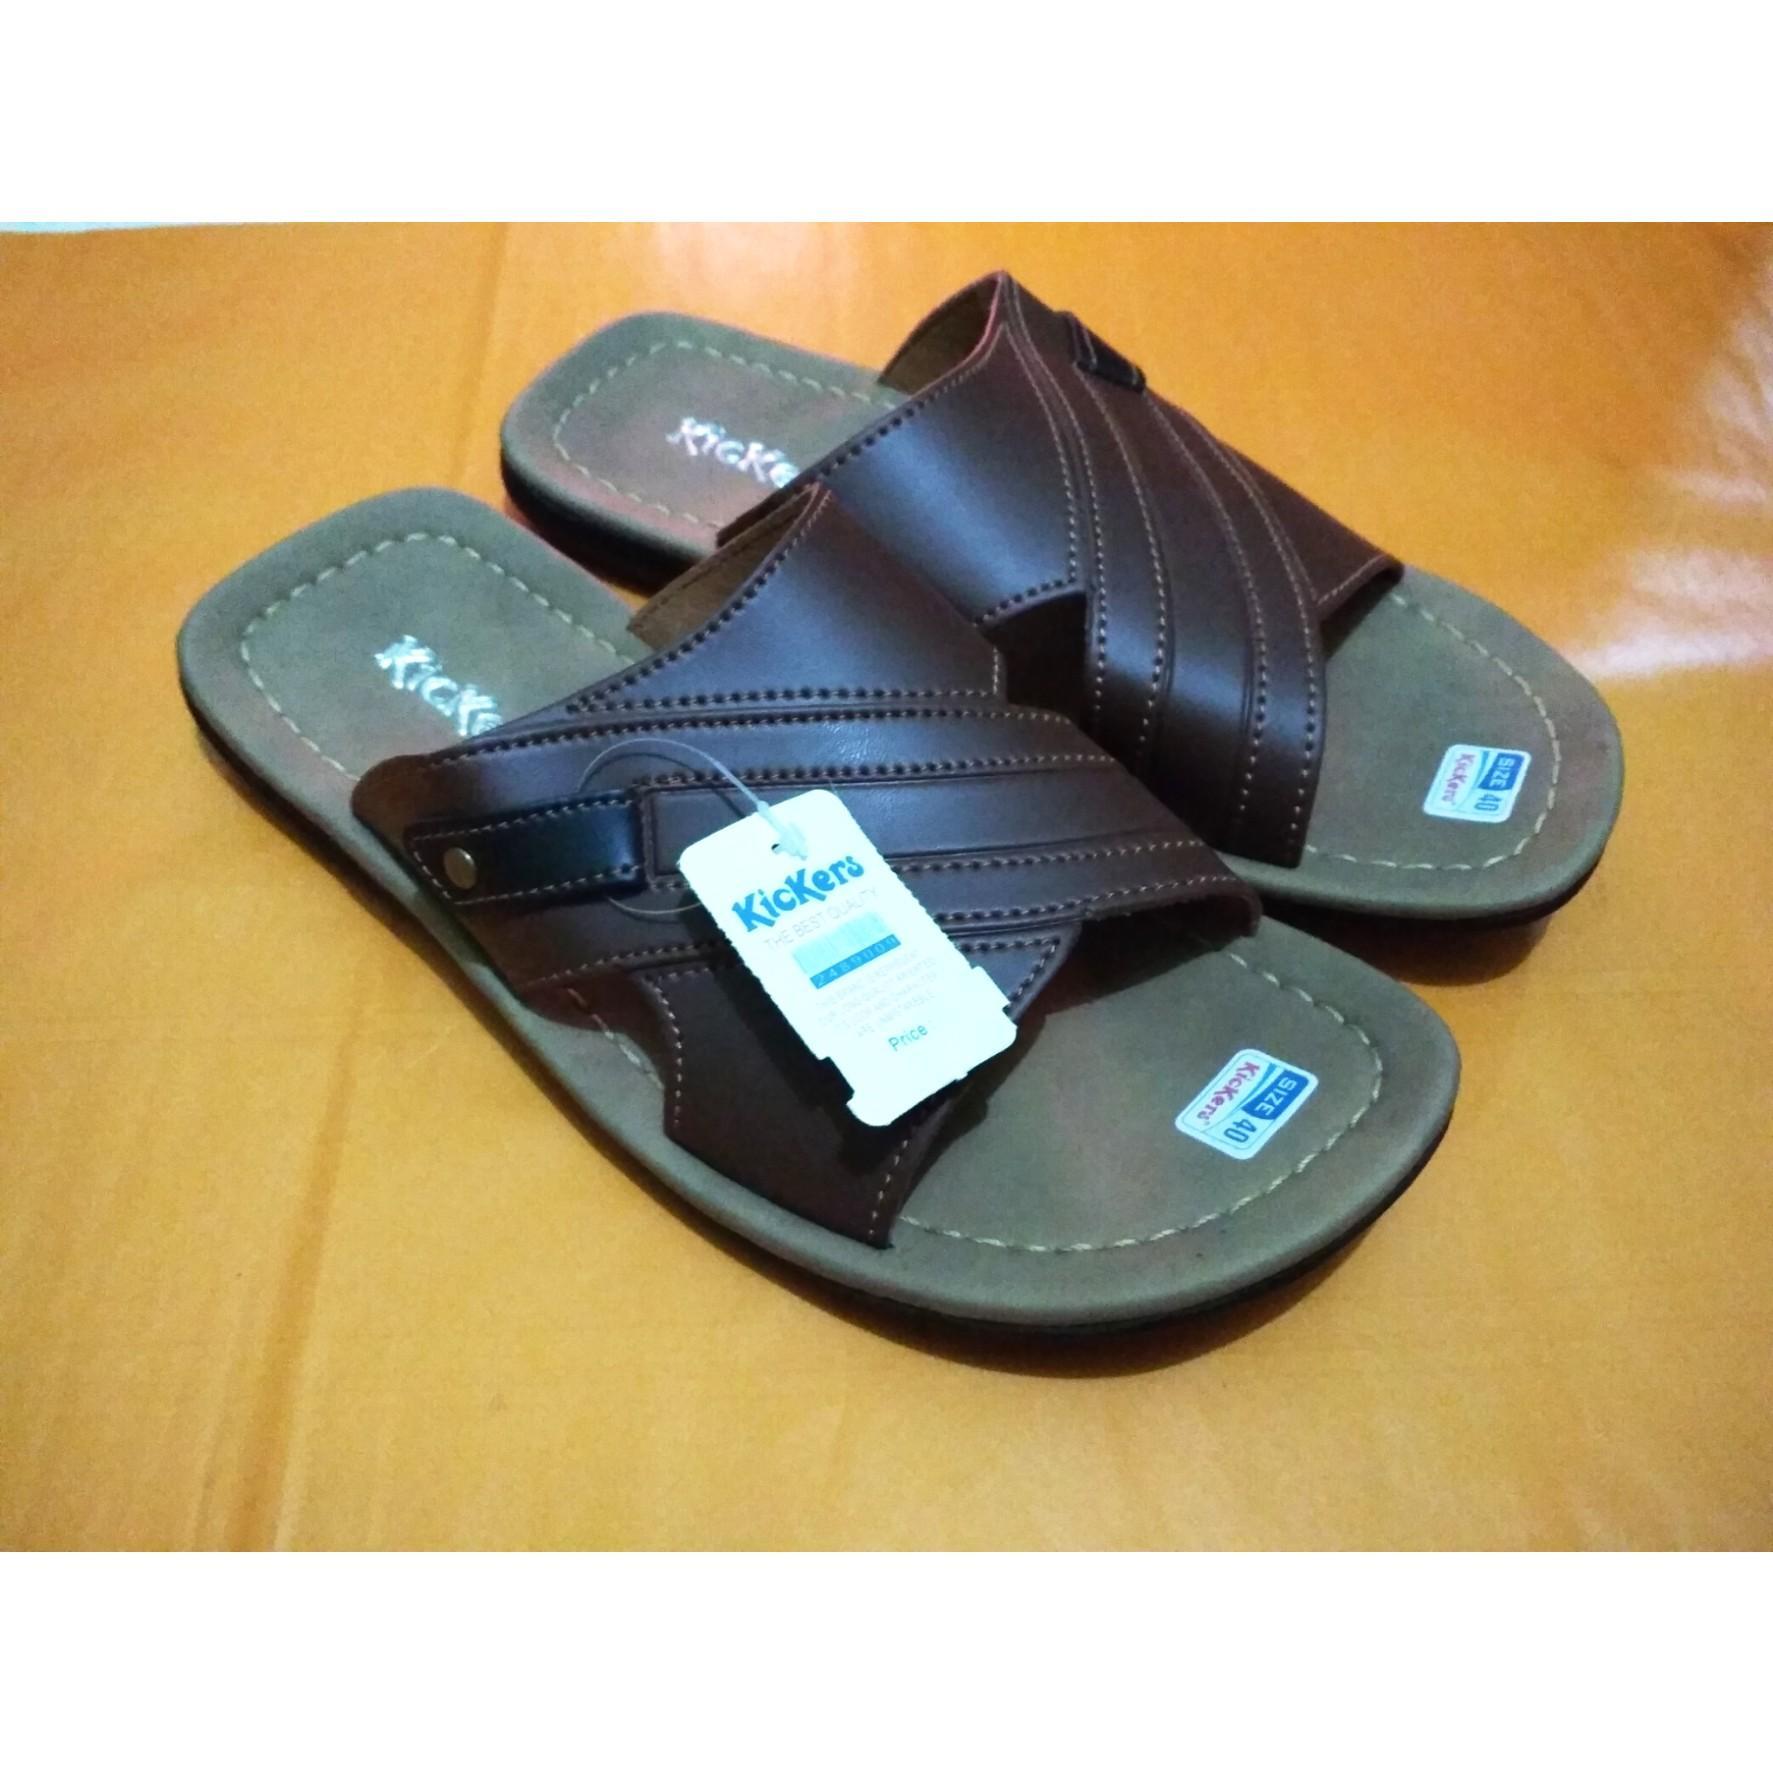 Kickers Sandal Kulit Pria - Sandal Kickers Pria - Sandal Pria Dewasa - Sandal  Kulit - ede748885e